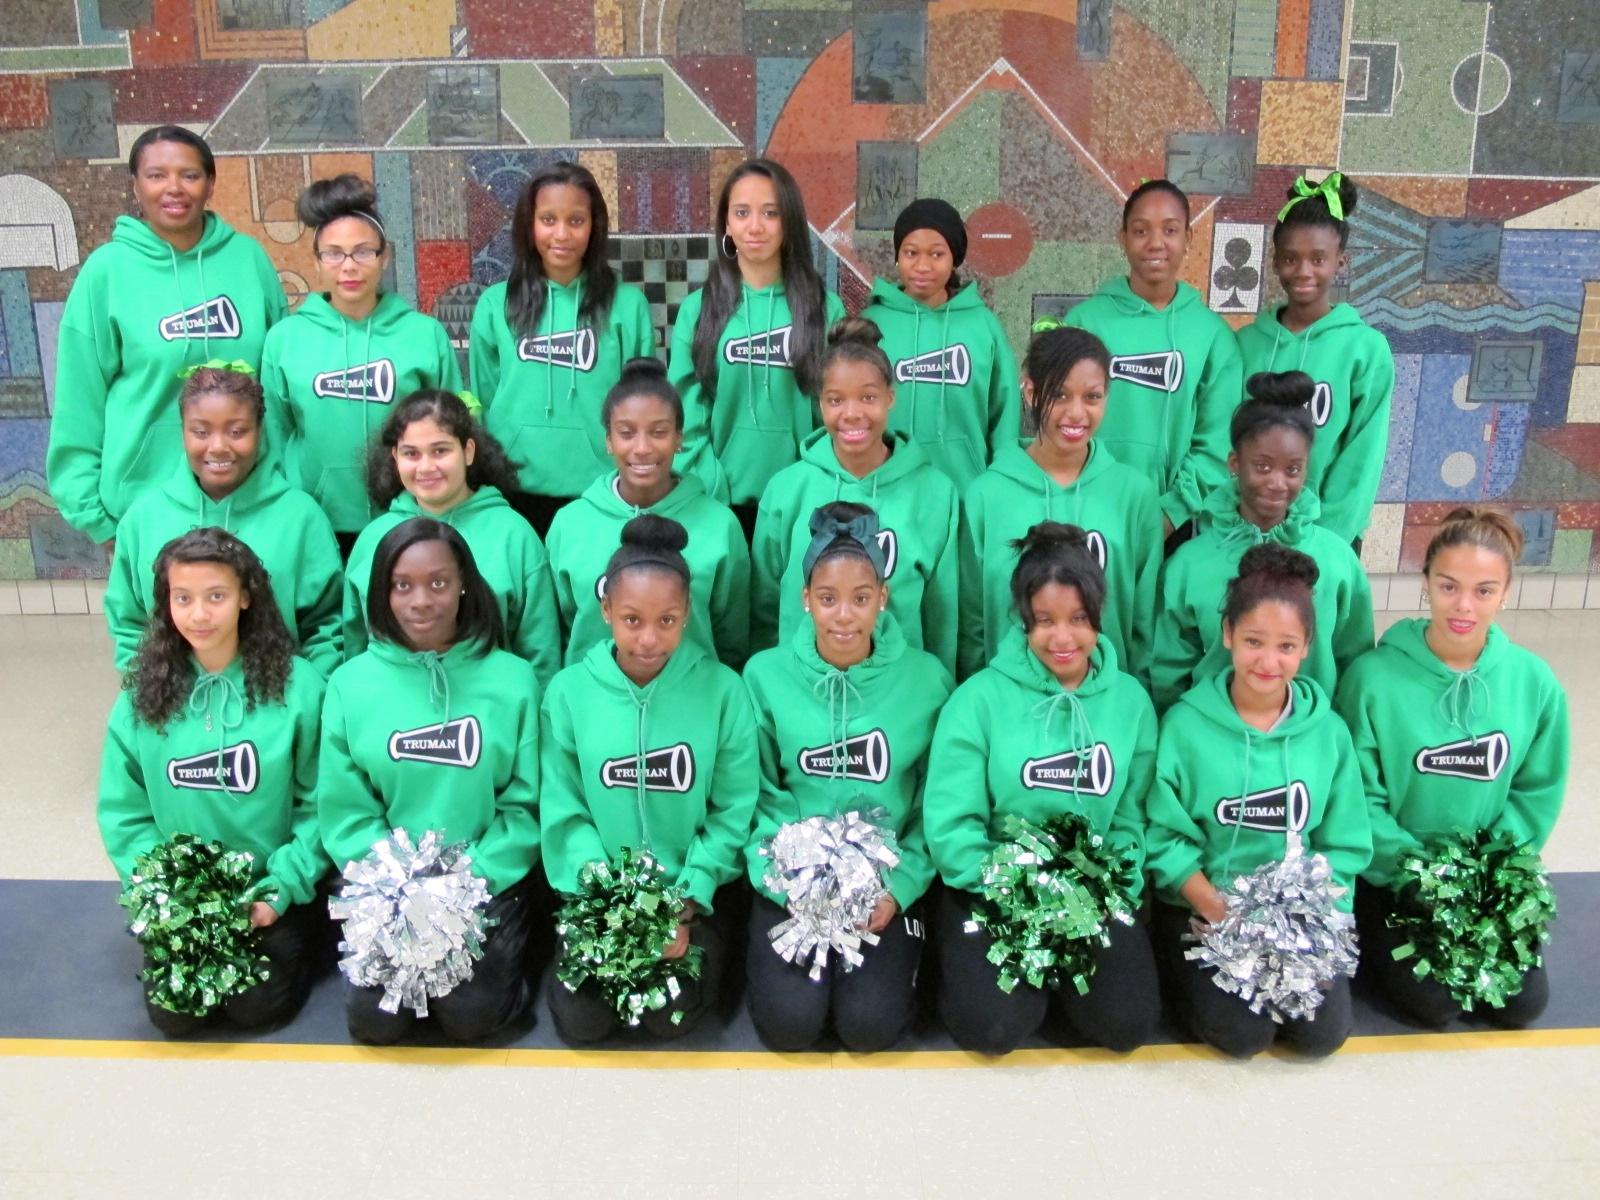 Img 6031 – Harry S Truman High School Pertaining To Nyc Doe School Calenders 2012